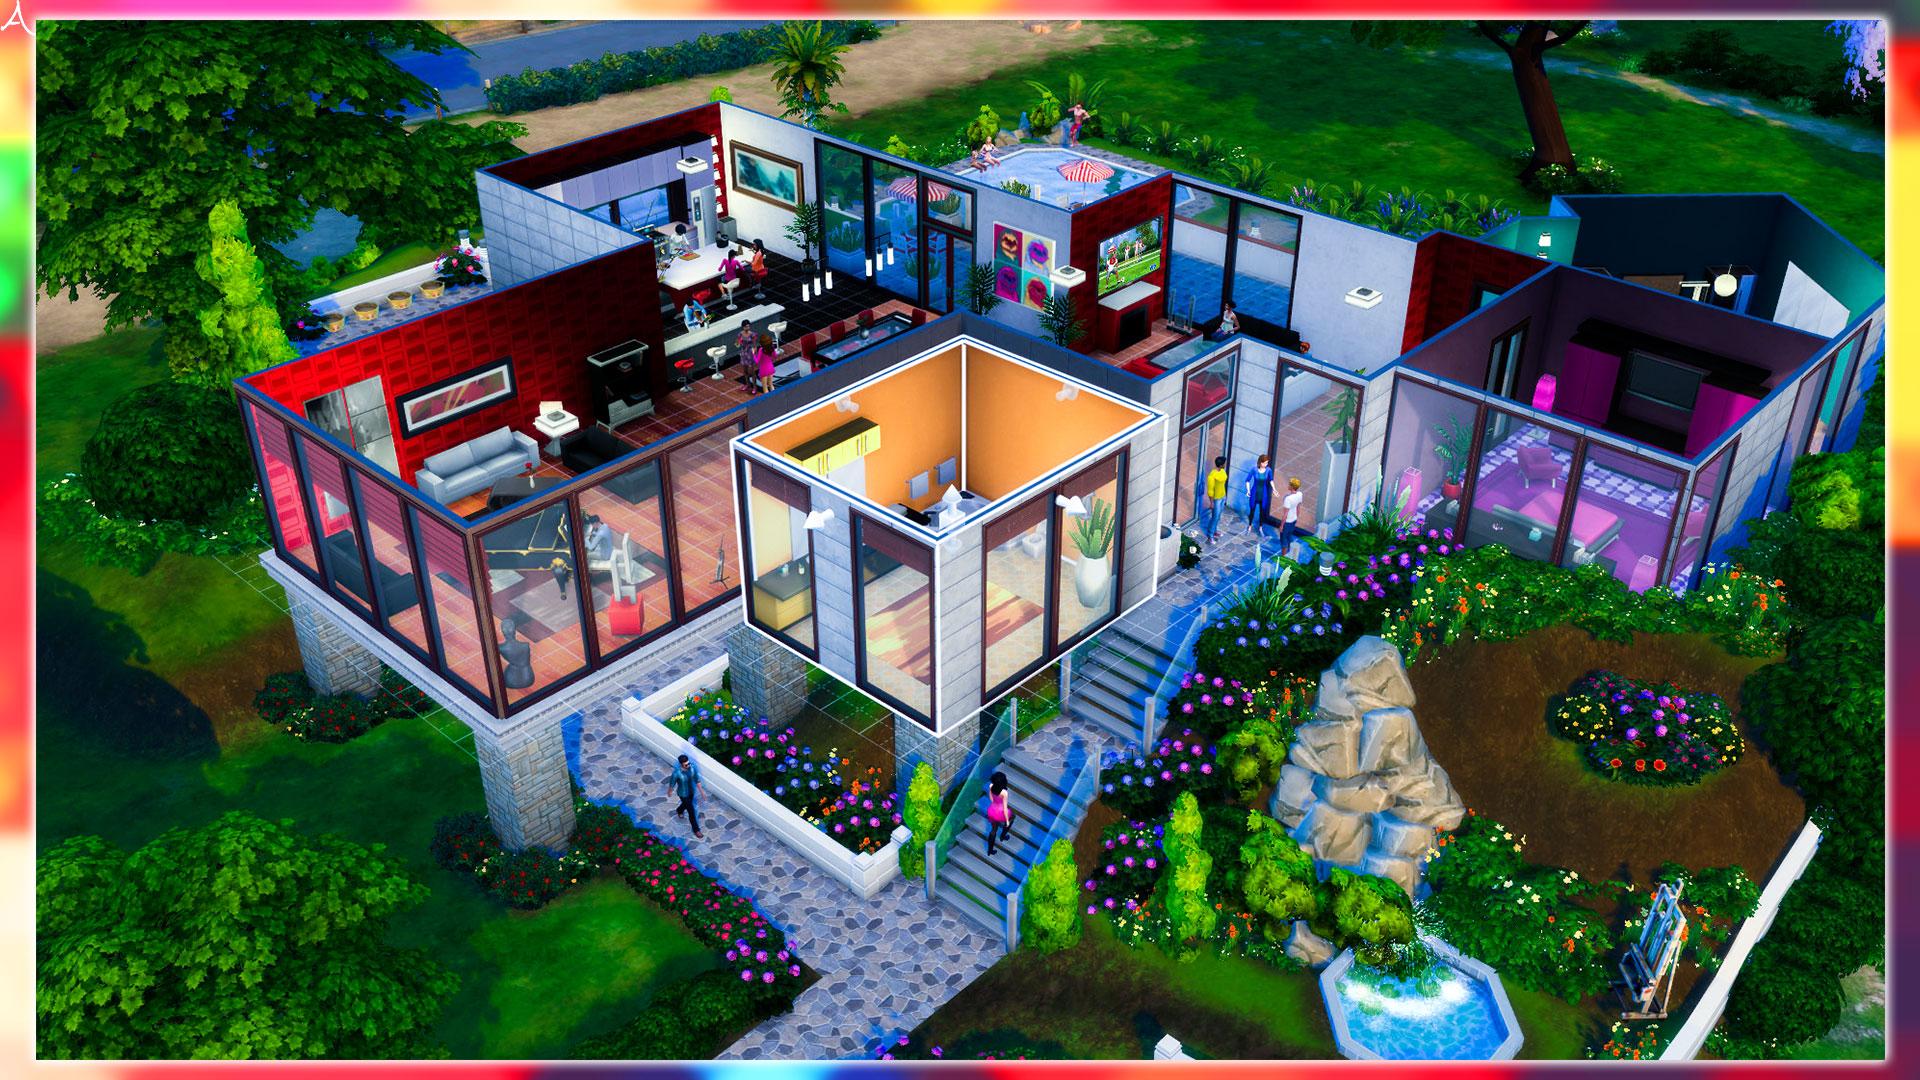 PC版「The Sims 4」(ザ・シムズ4)に必要な最低/推奨スペックを確認